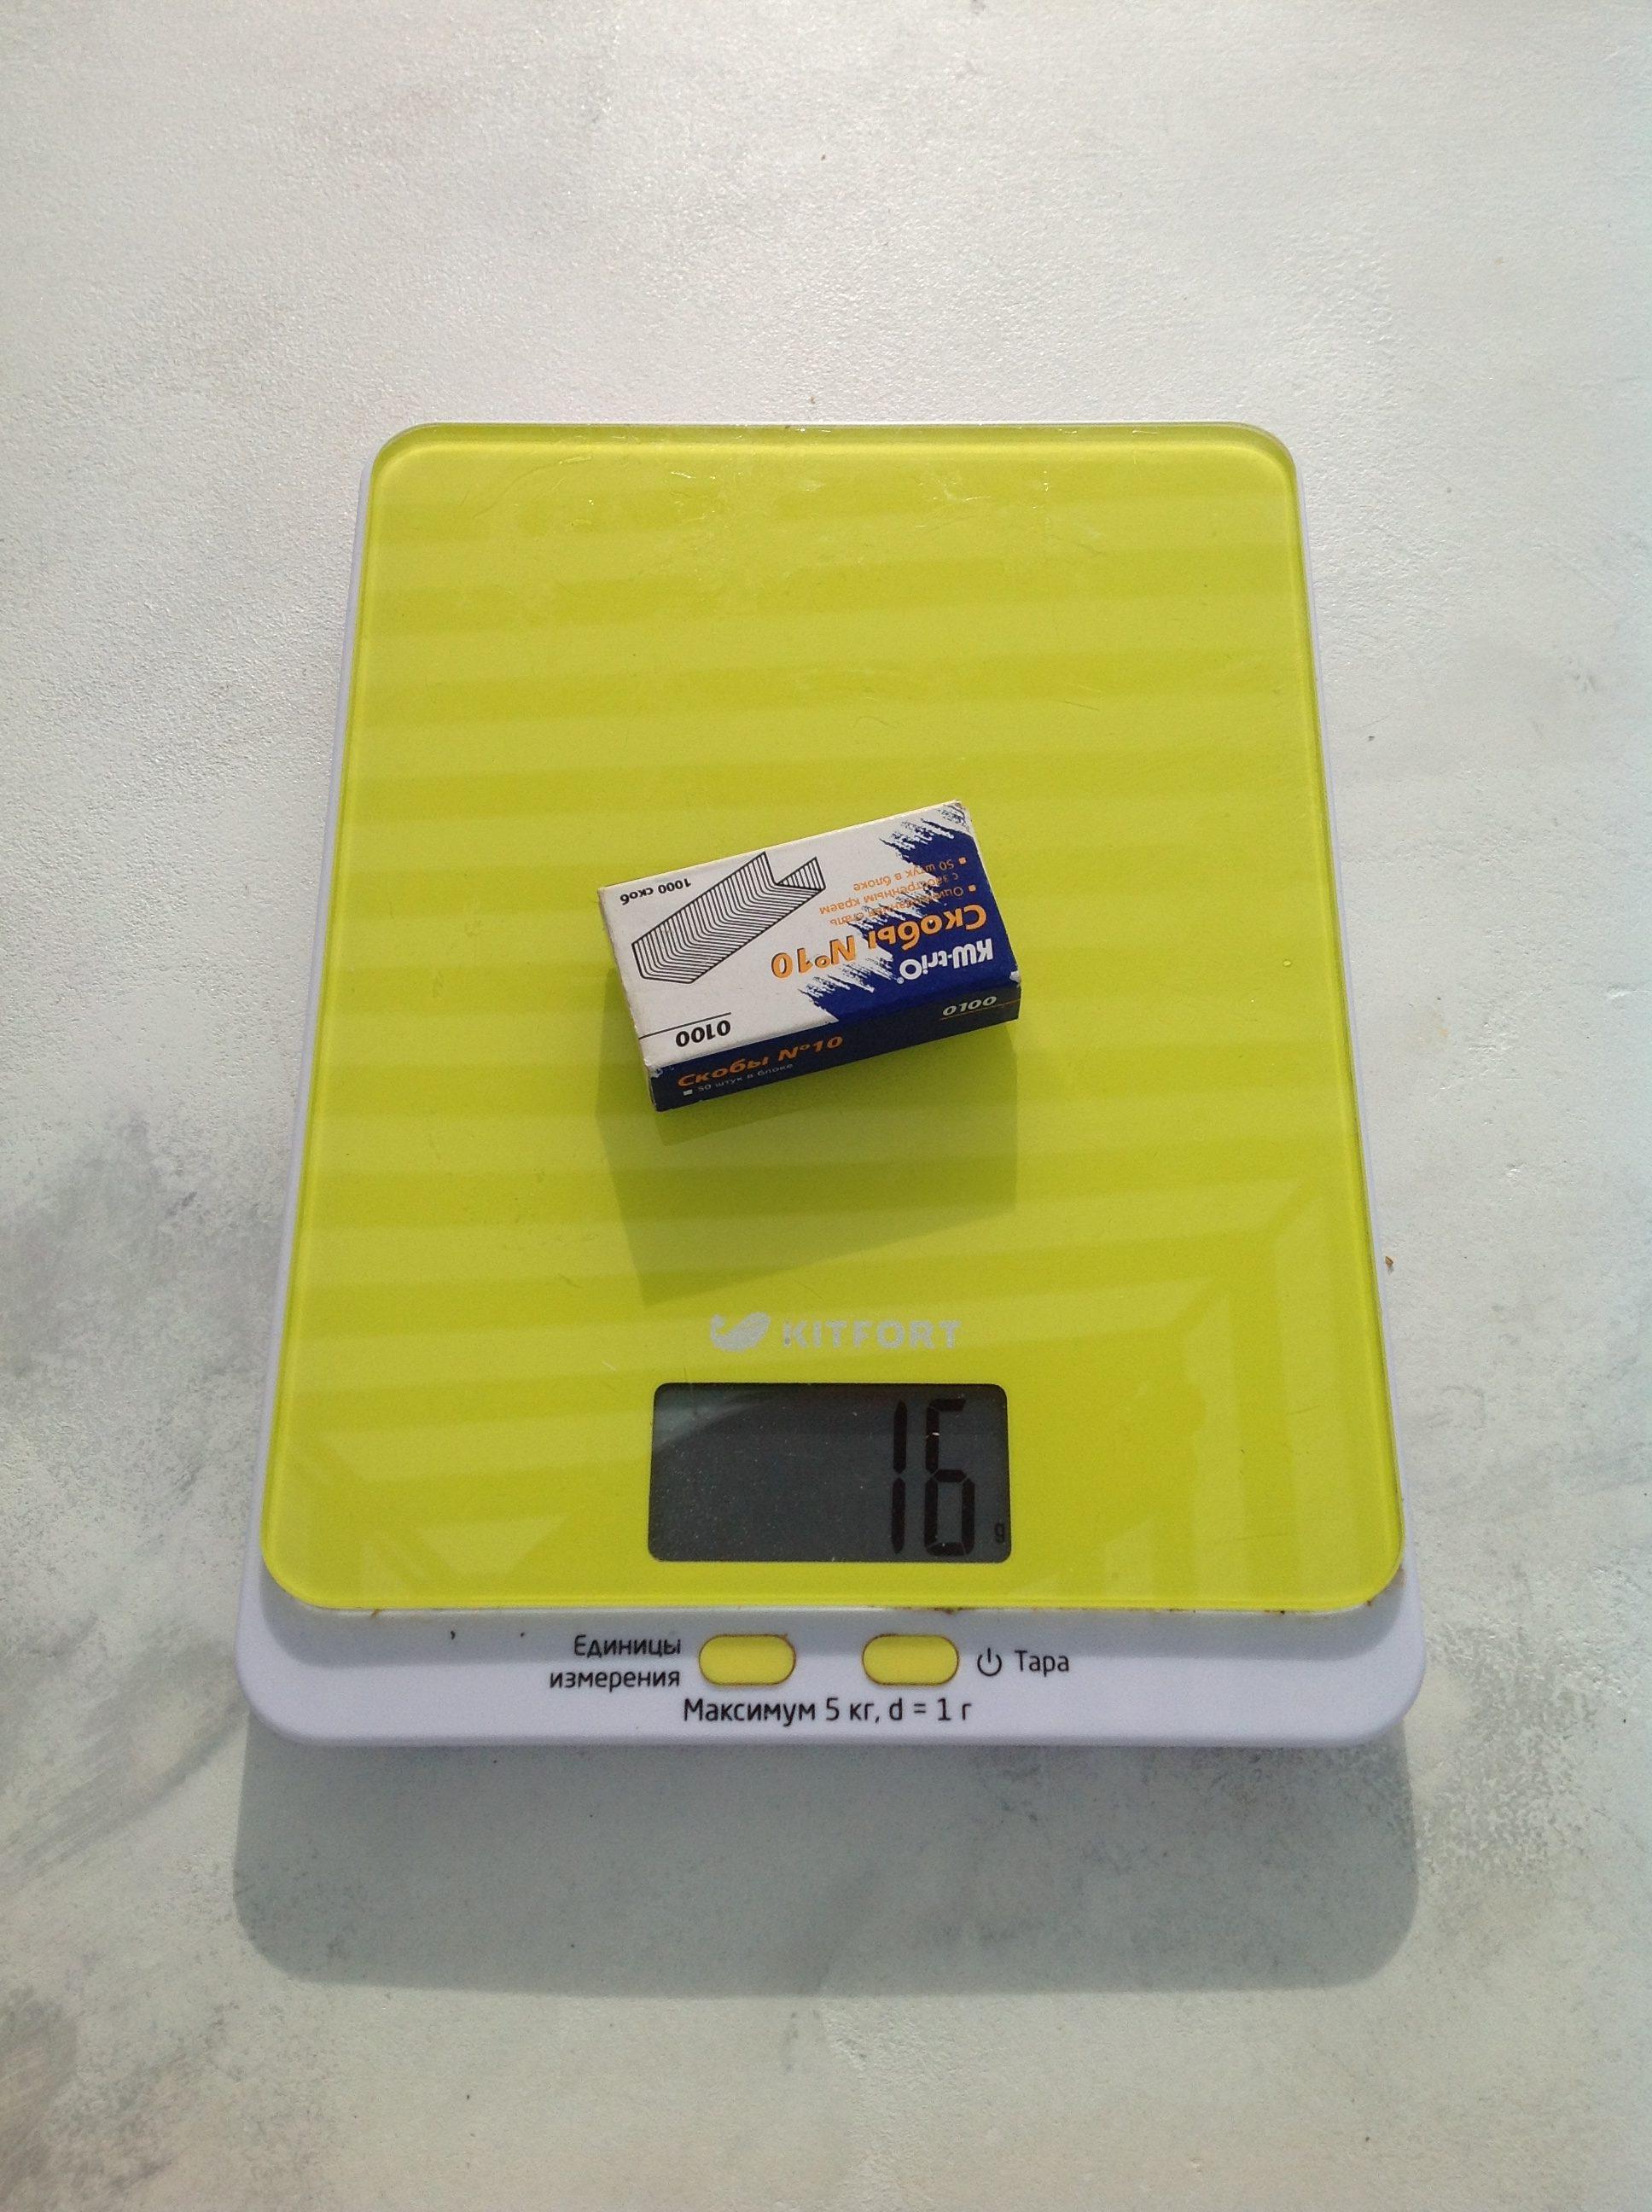 вес набора канцелярских скоб для степлера